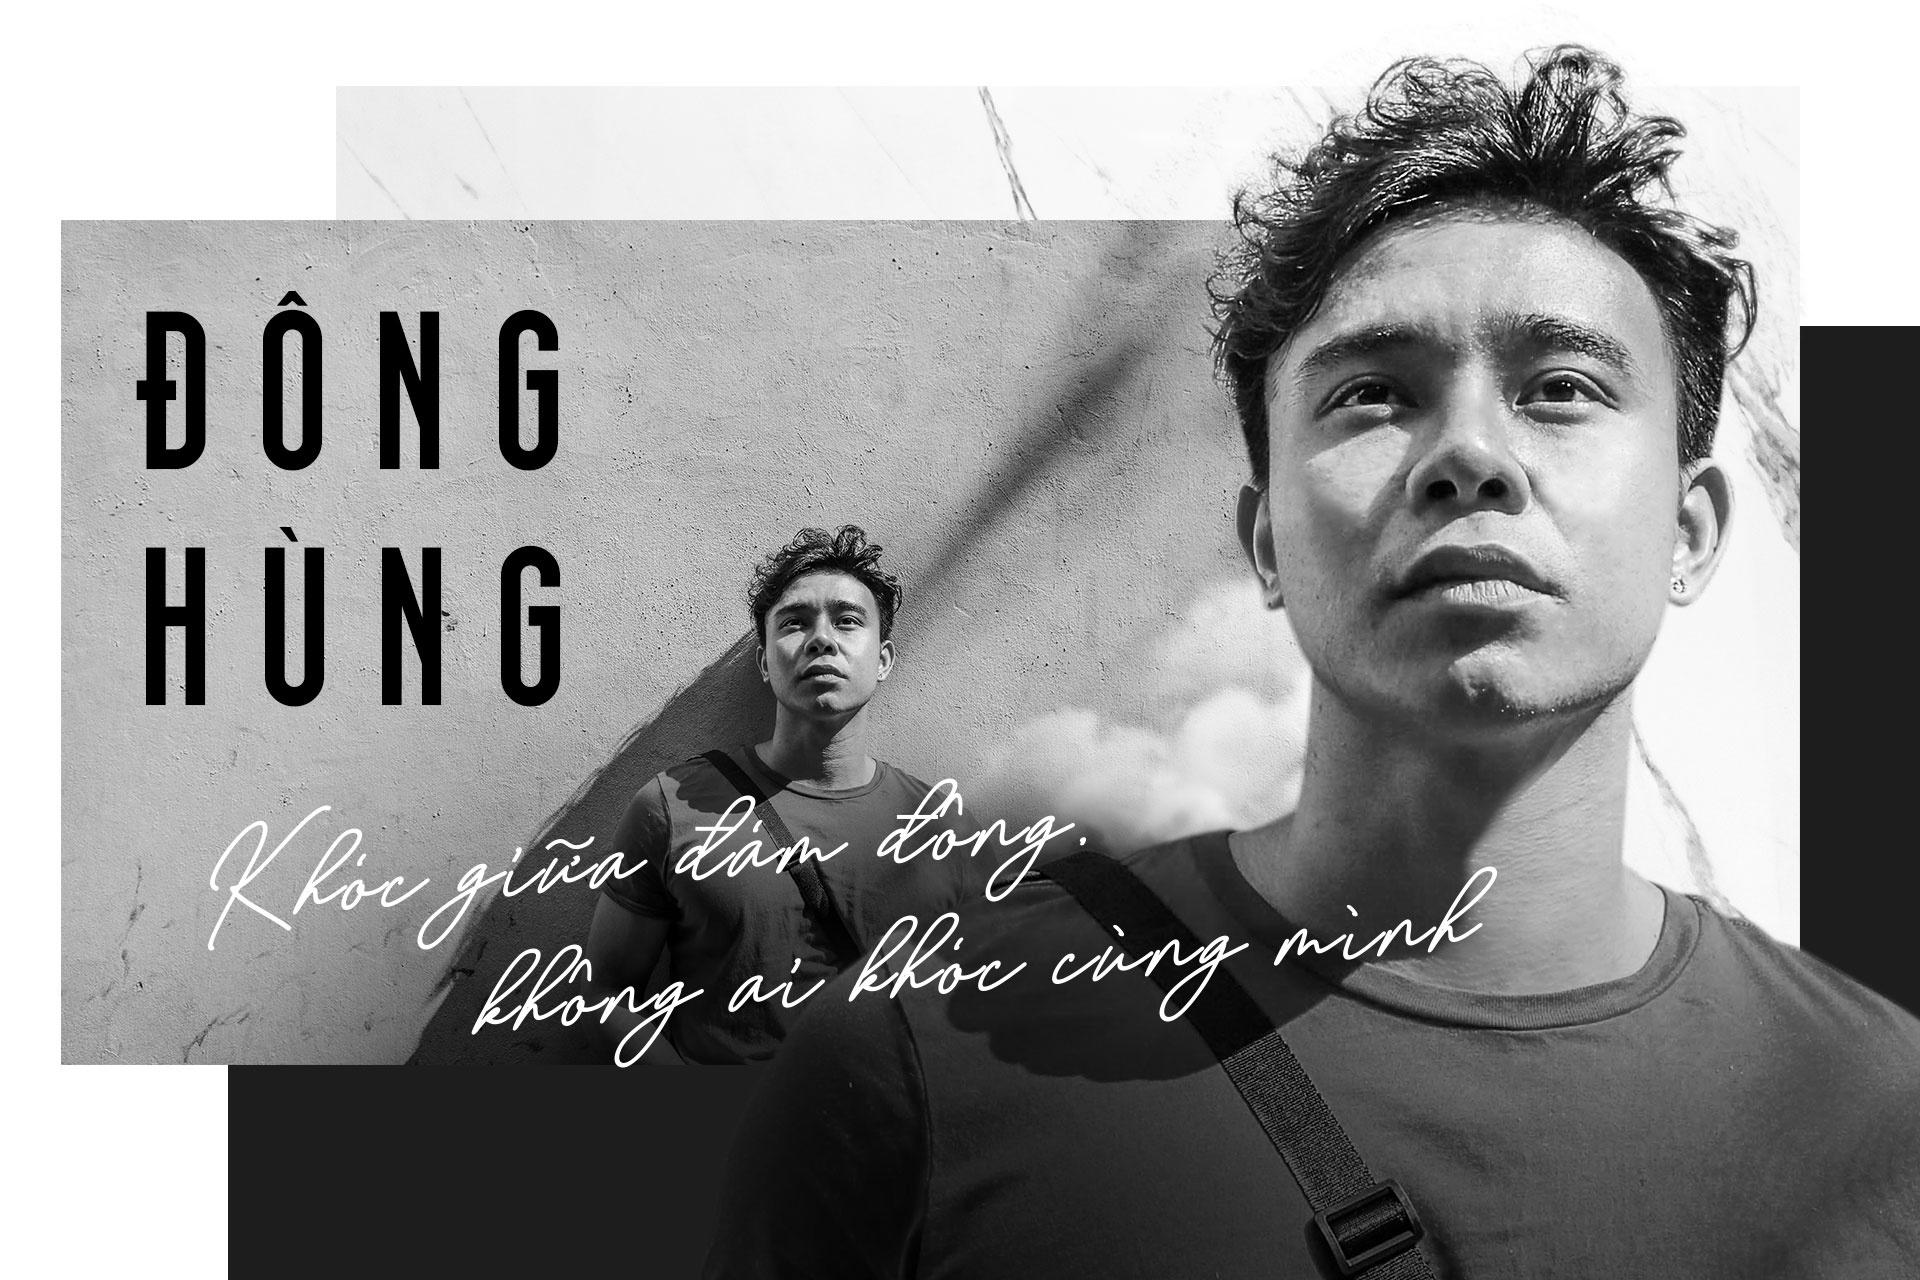 Dong Hung: 'Khoc giua dam dong, khong ai khoc cung minh' hinh anh 2